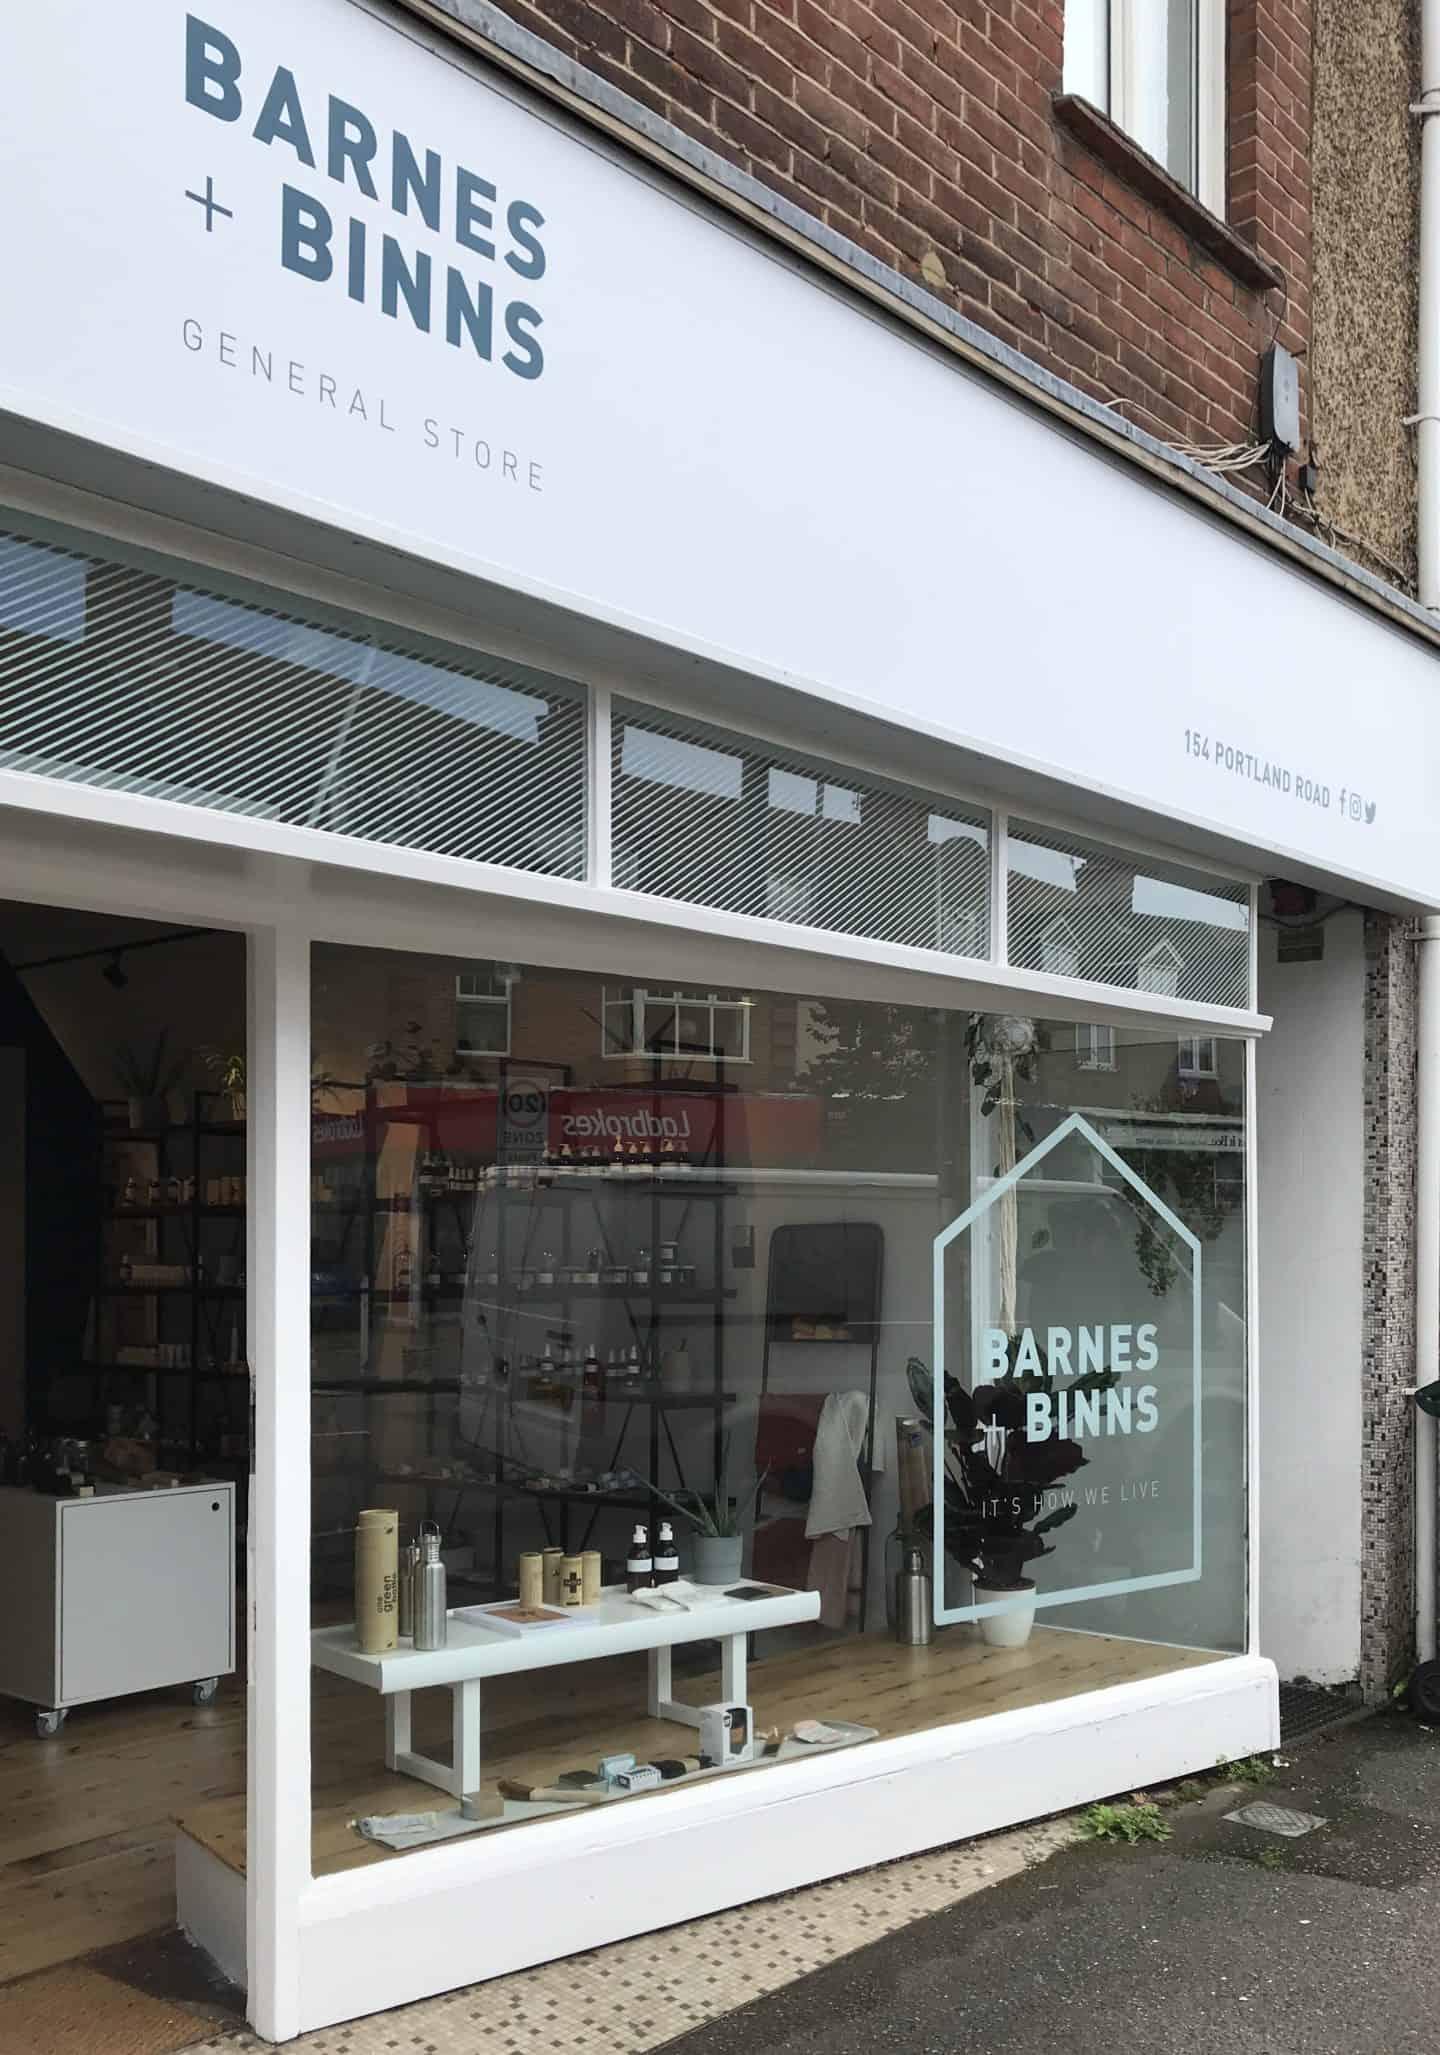 Barnes + Binns shopfront in Hove